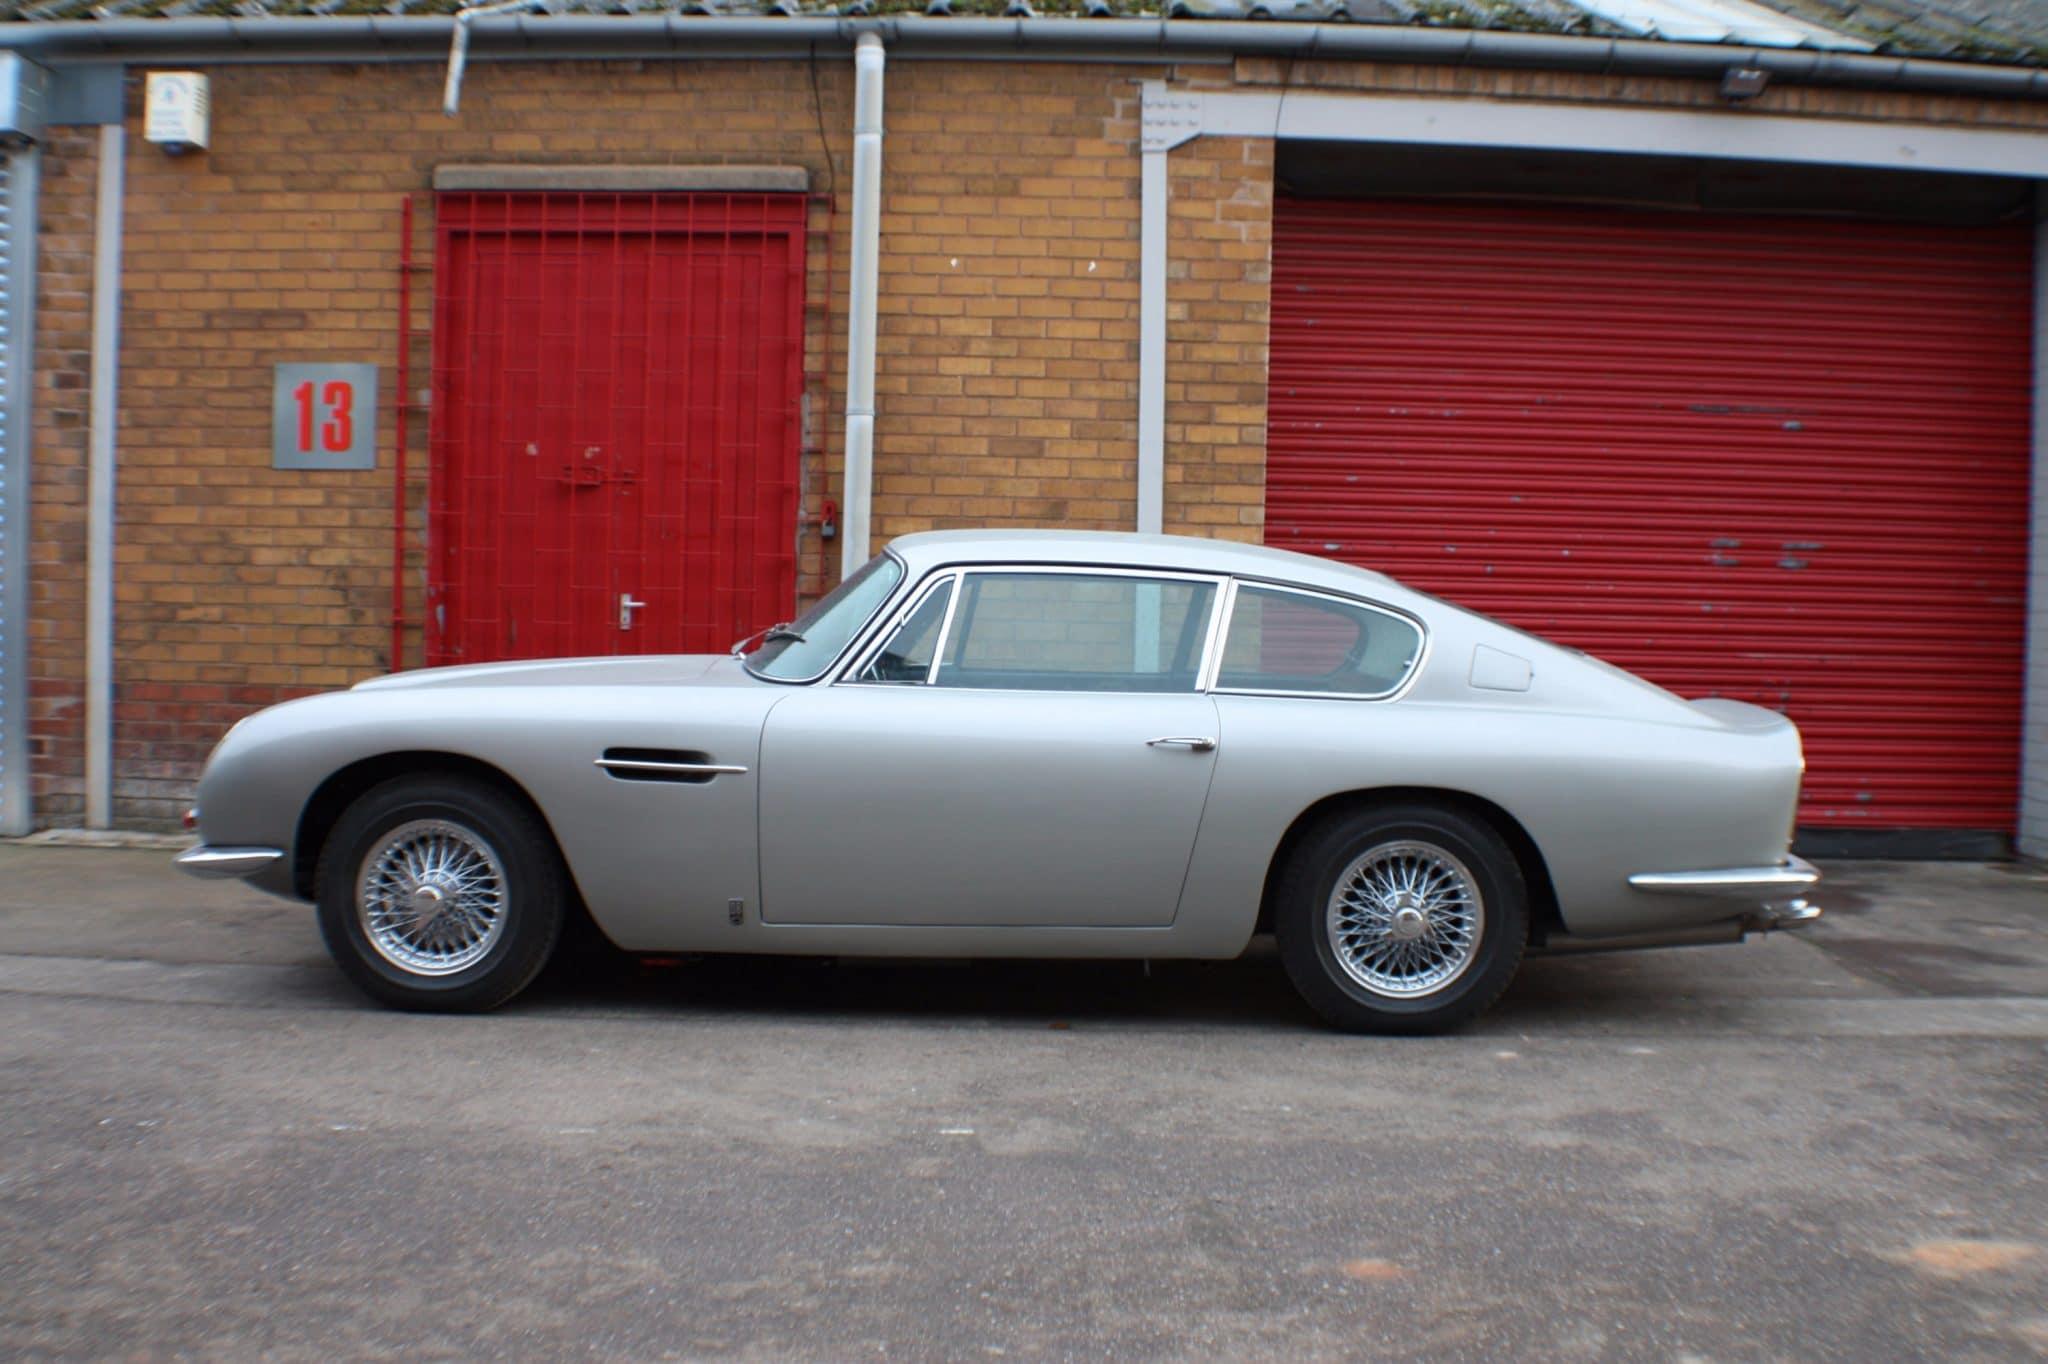 Aston Martin DB6 side view